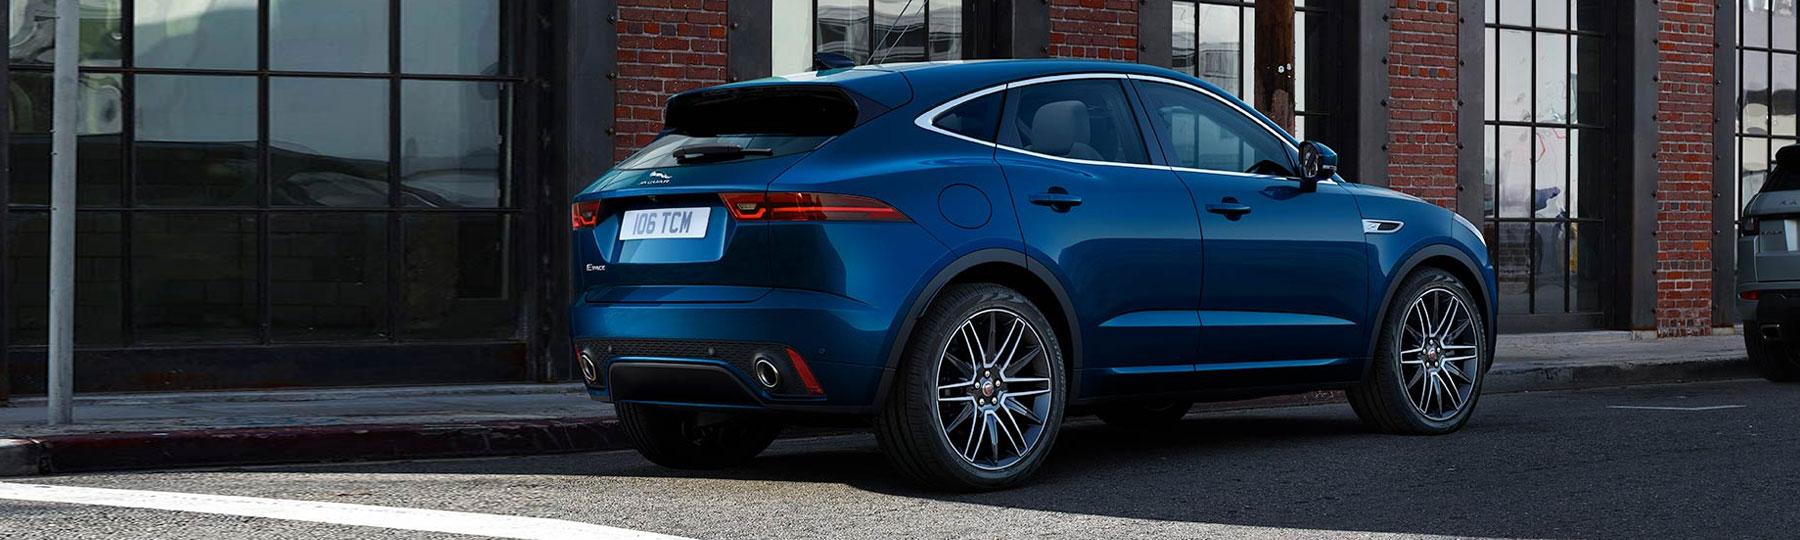 New Jaguar E-PACE Business Offer